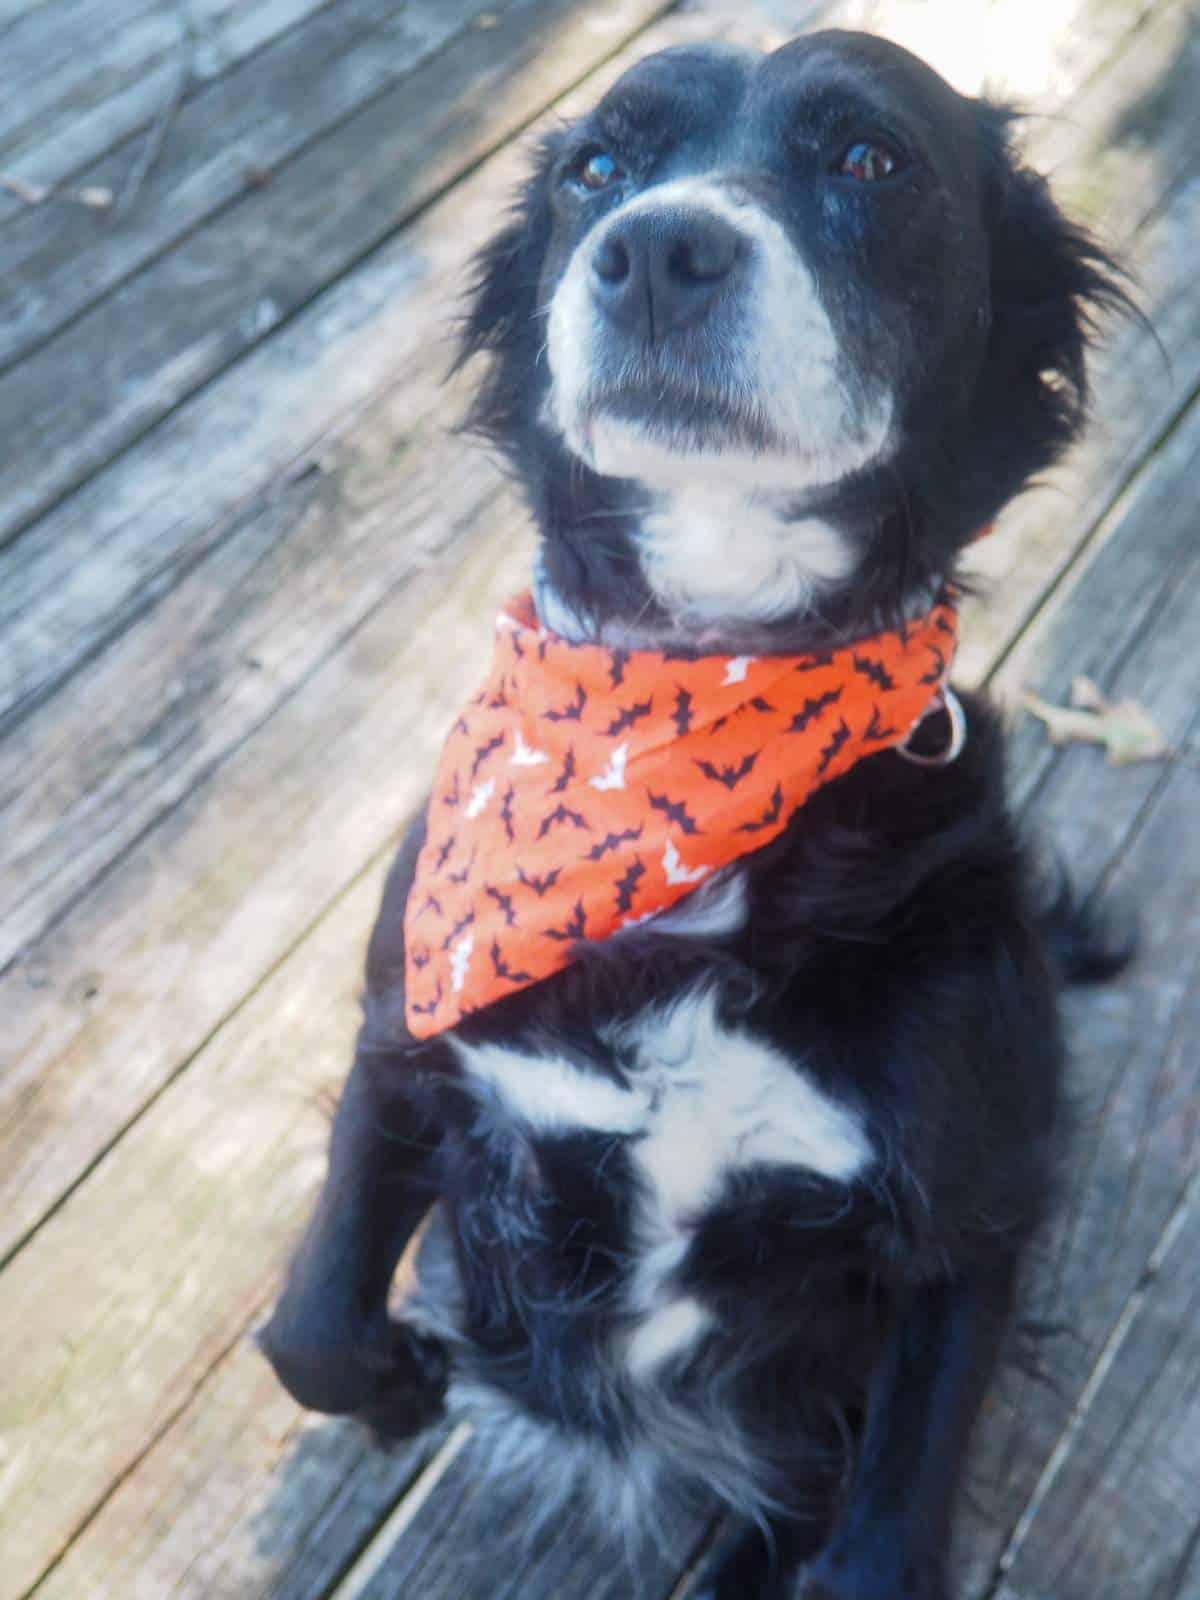 A black and white dog in an orange bandana sitting pretty for a treat.